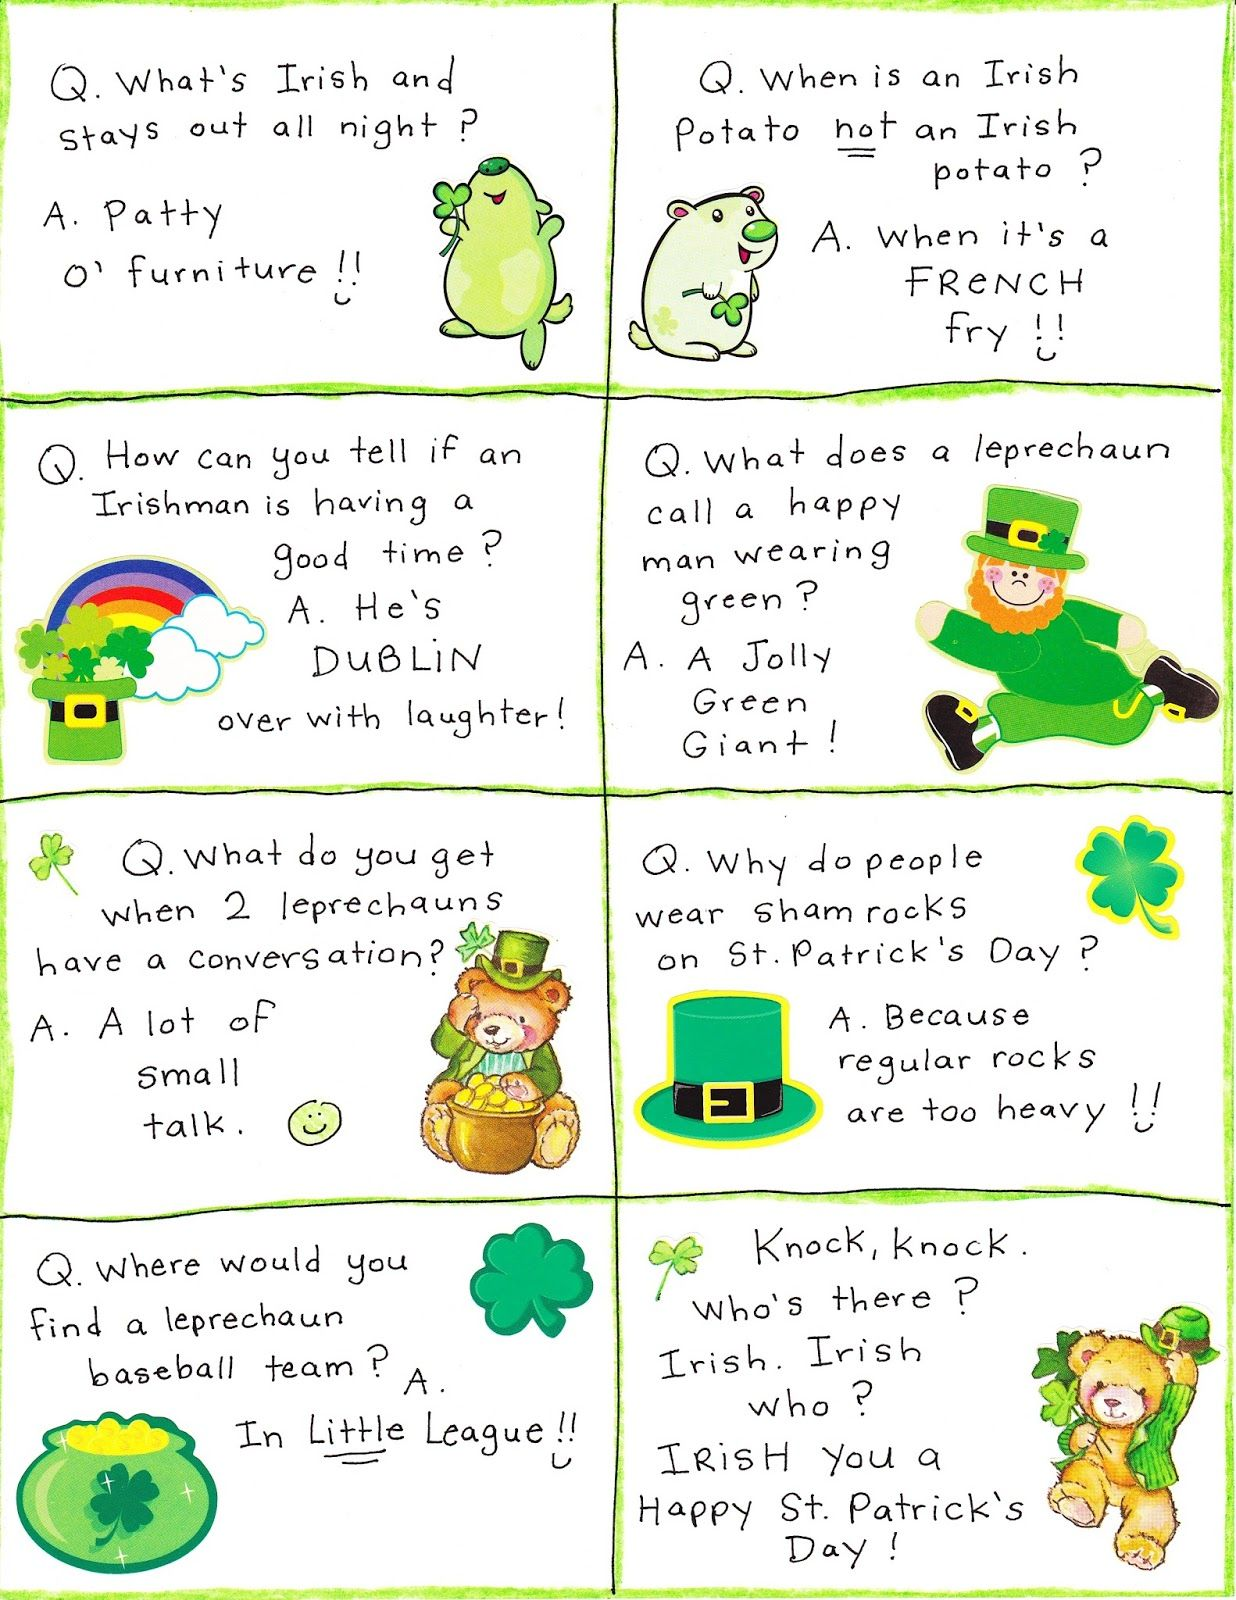 Uncategorized Irish Riddles st patricks day irish jokes limericks riddles one liners short clean